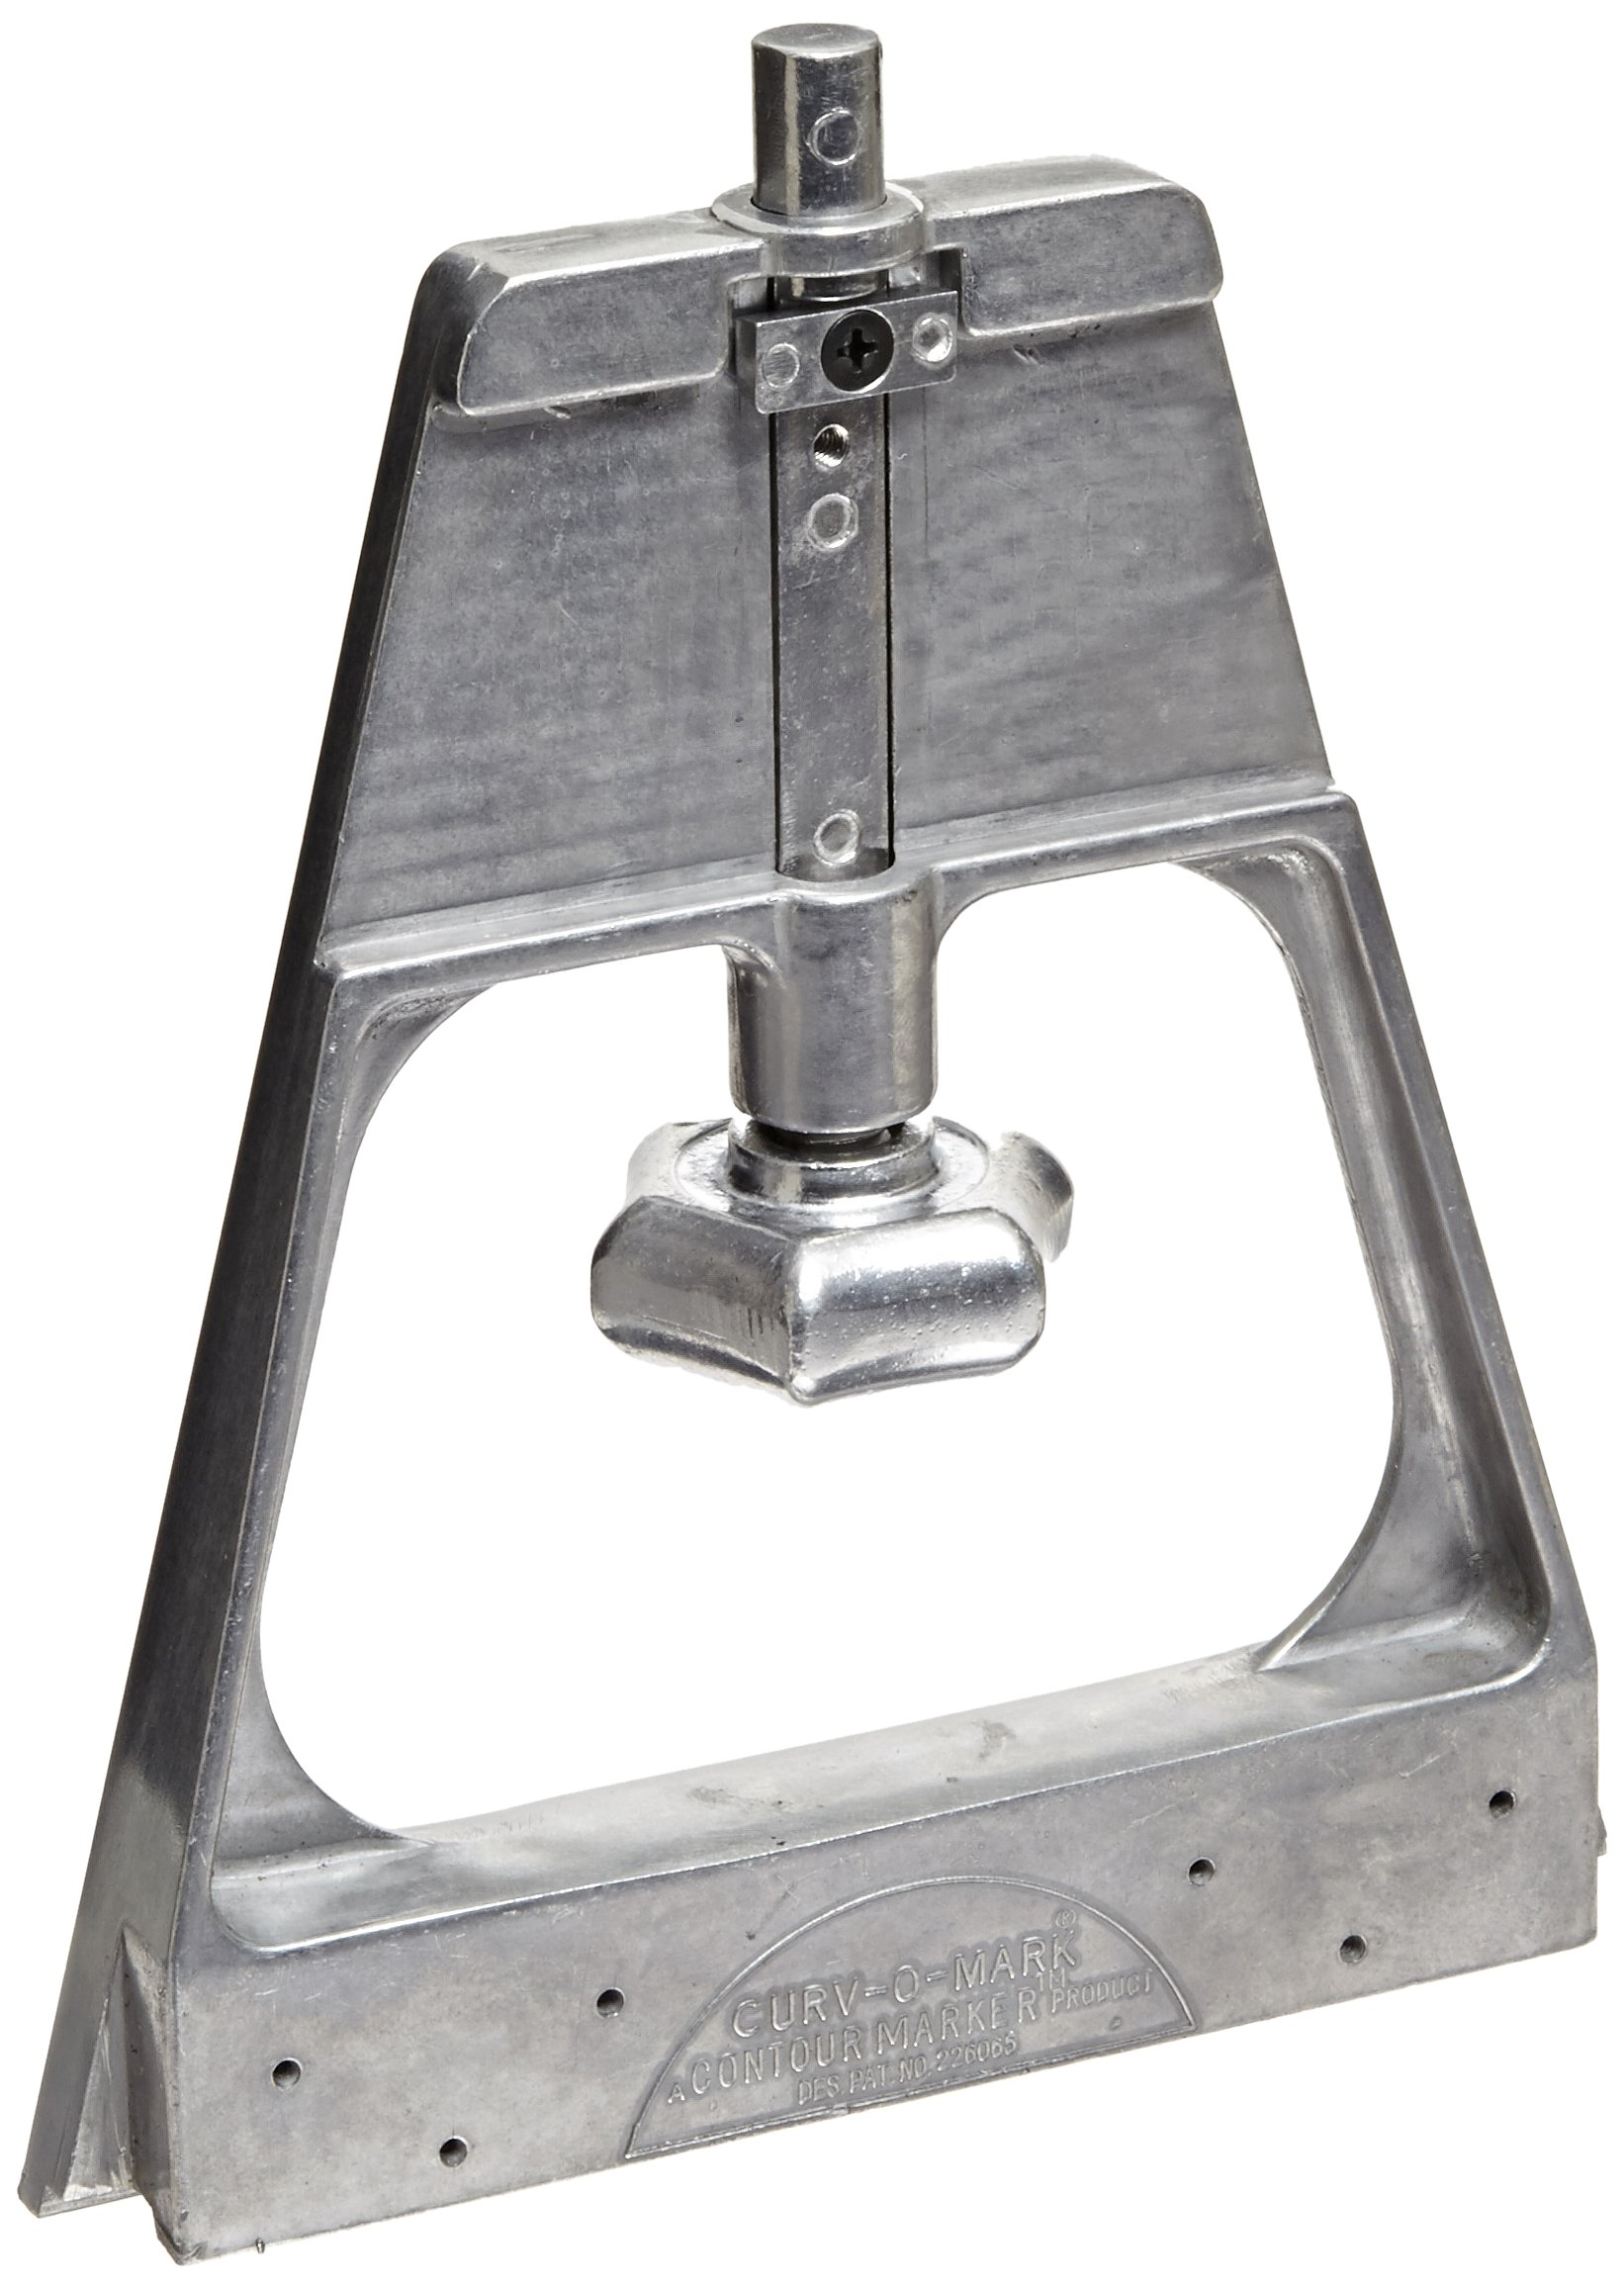 Jackson Safety 14795 Curv-O-Mark #32 Flange Aligner Base